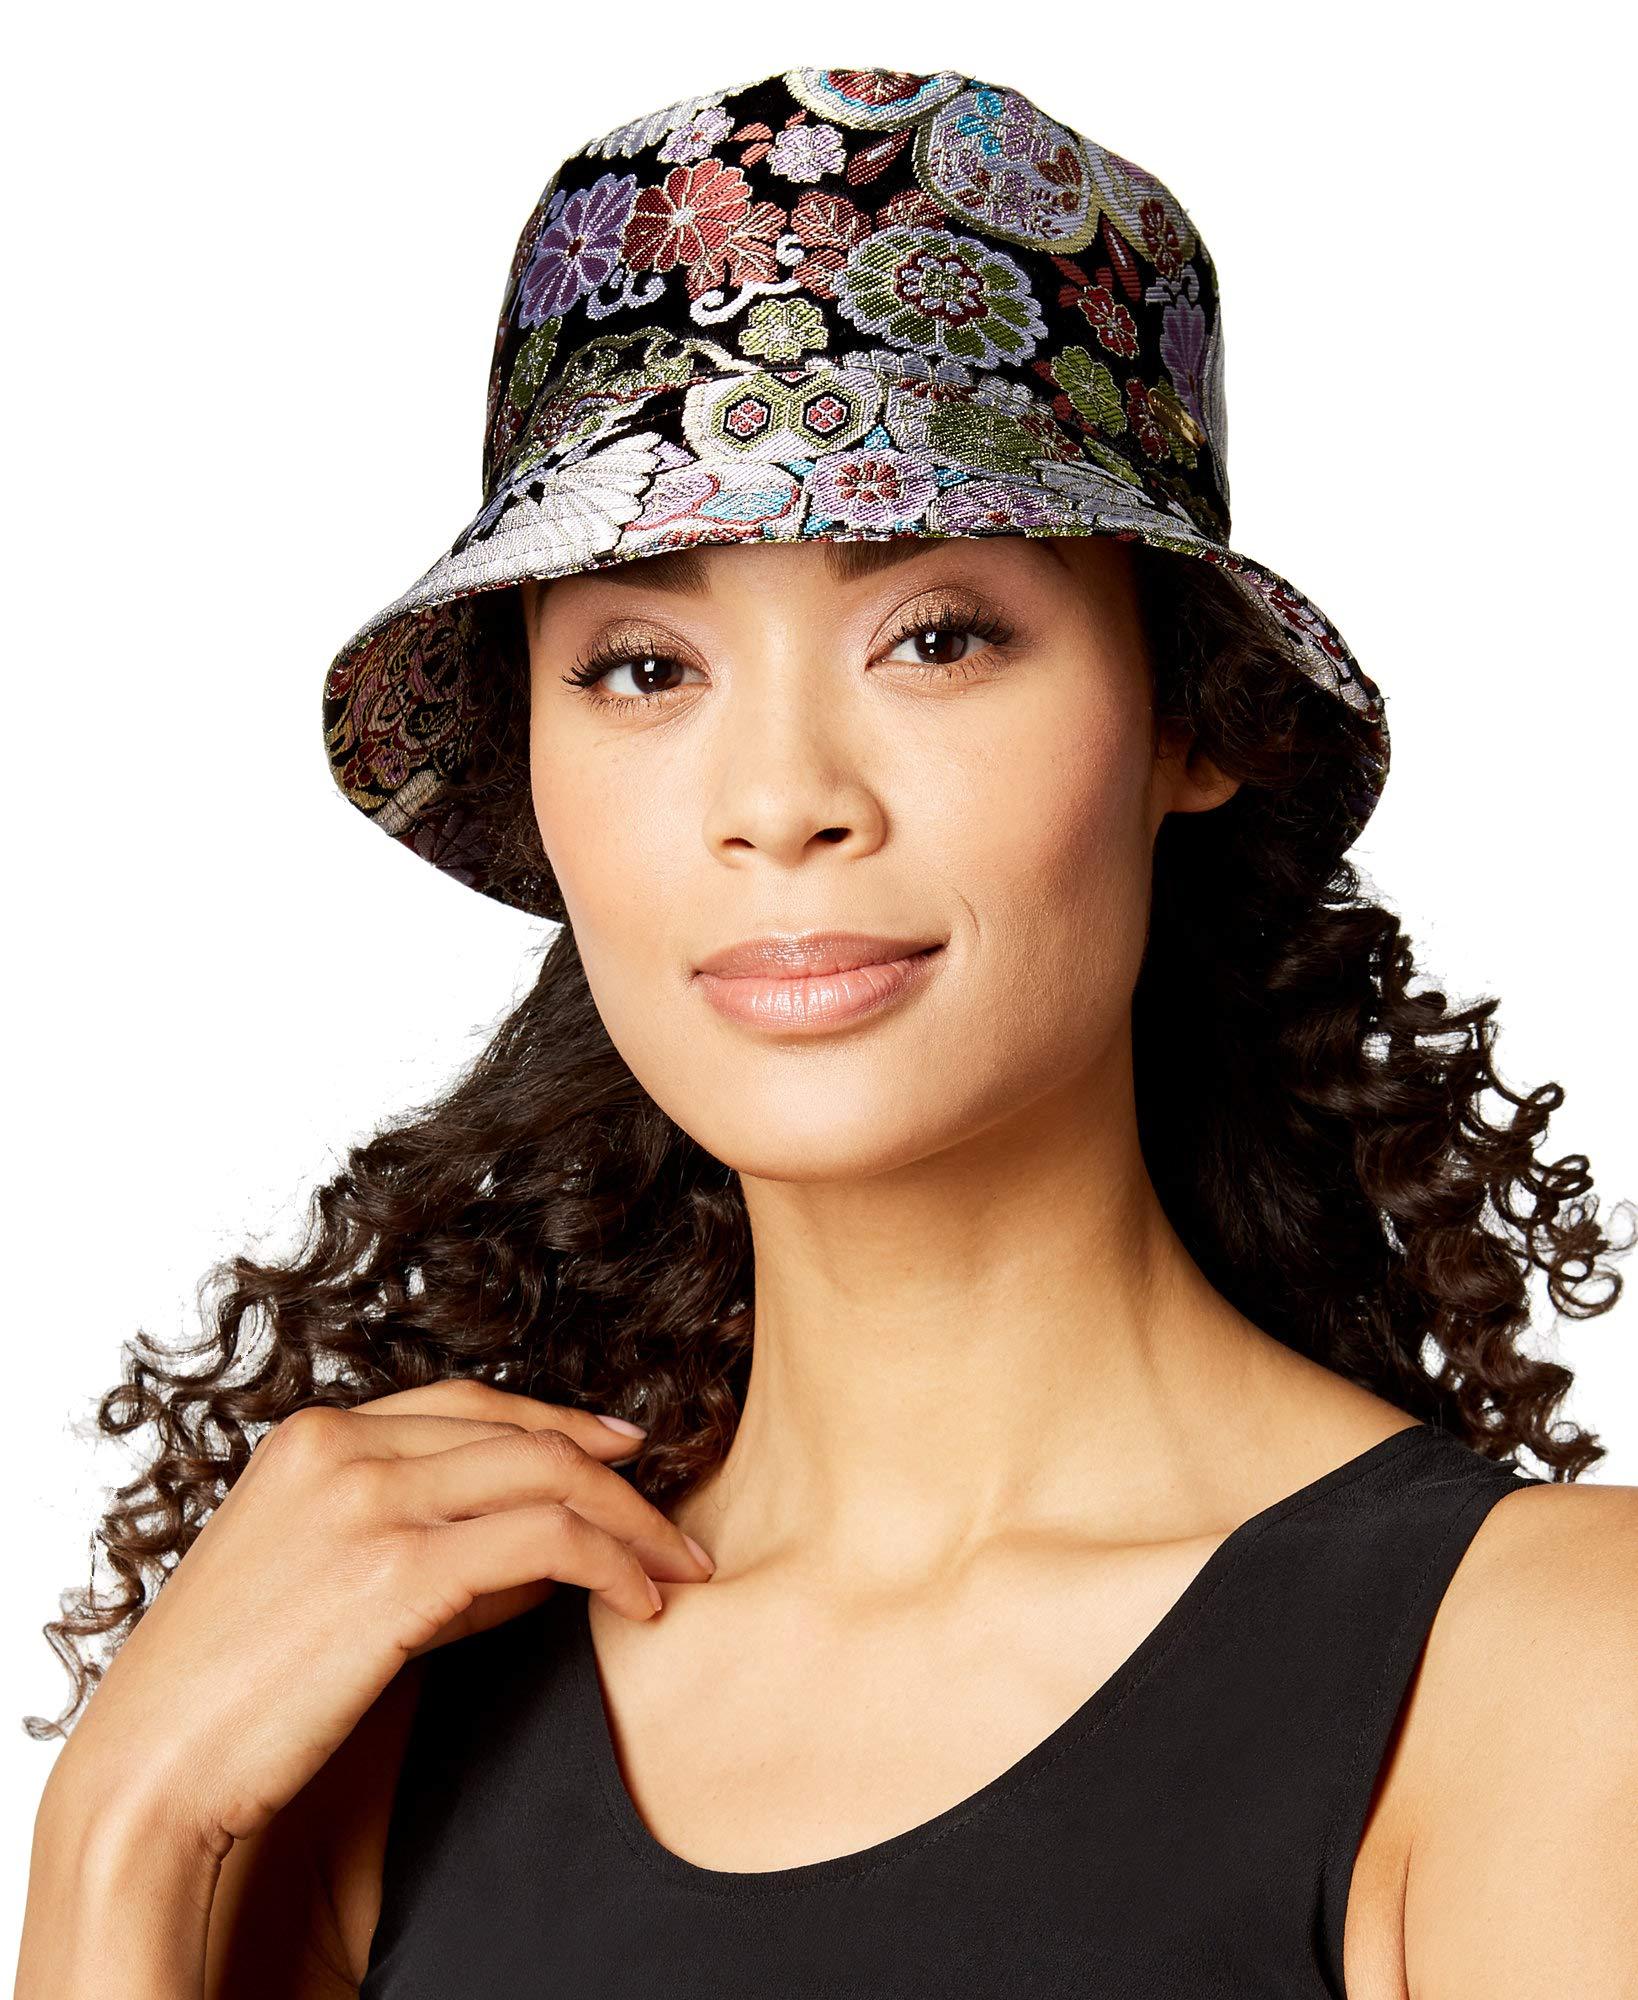 Steve Madden Women's Floral Brocade Bucket Hat,Black Multi,One Size